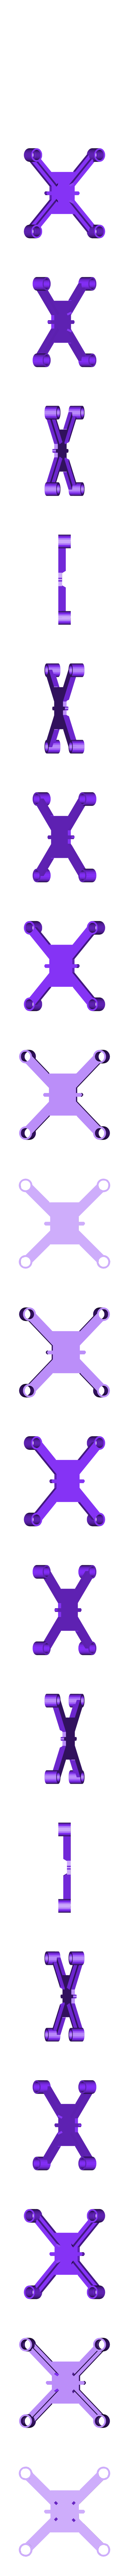 dronedrame_6mm_motors_lite.stl Download free STL file Drone Frame for all motor sizes ! - 6mm,6.5mm,7mm,7.5mm,8mm,8.5mm • 3D printable model, Gophy